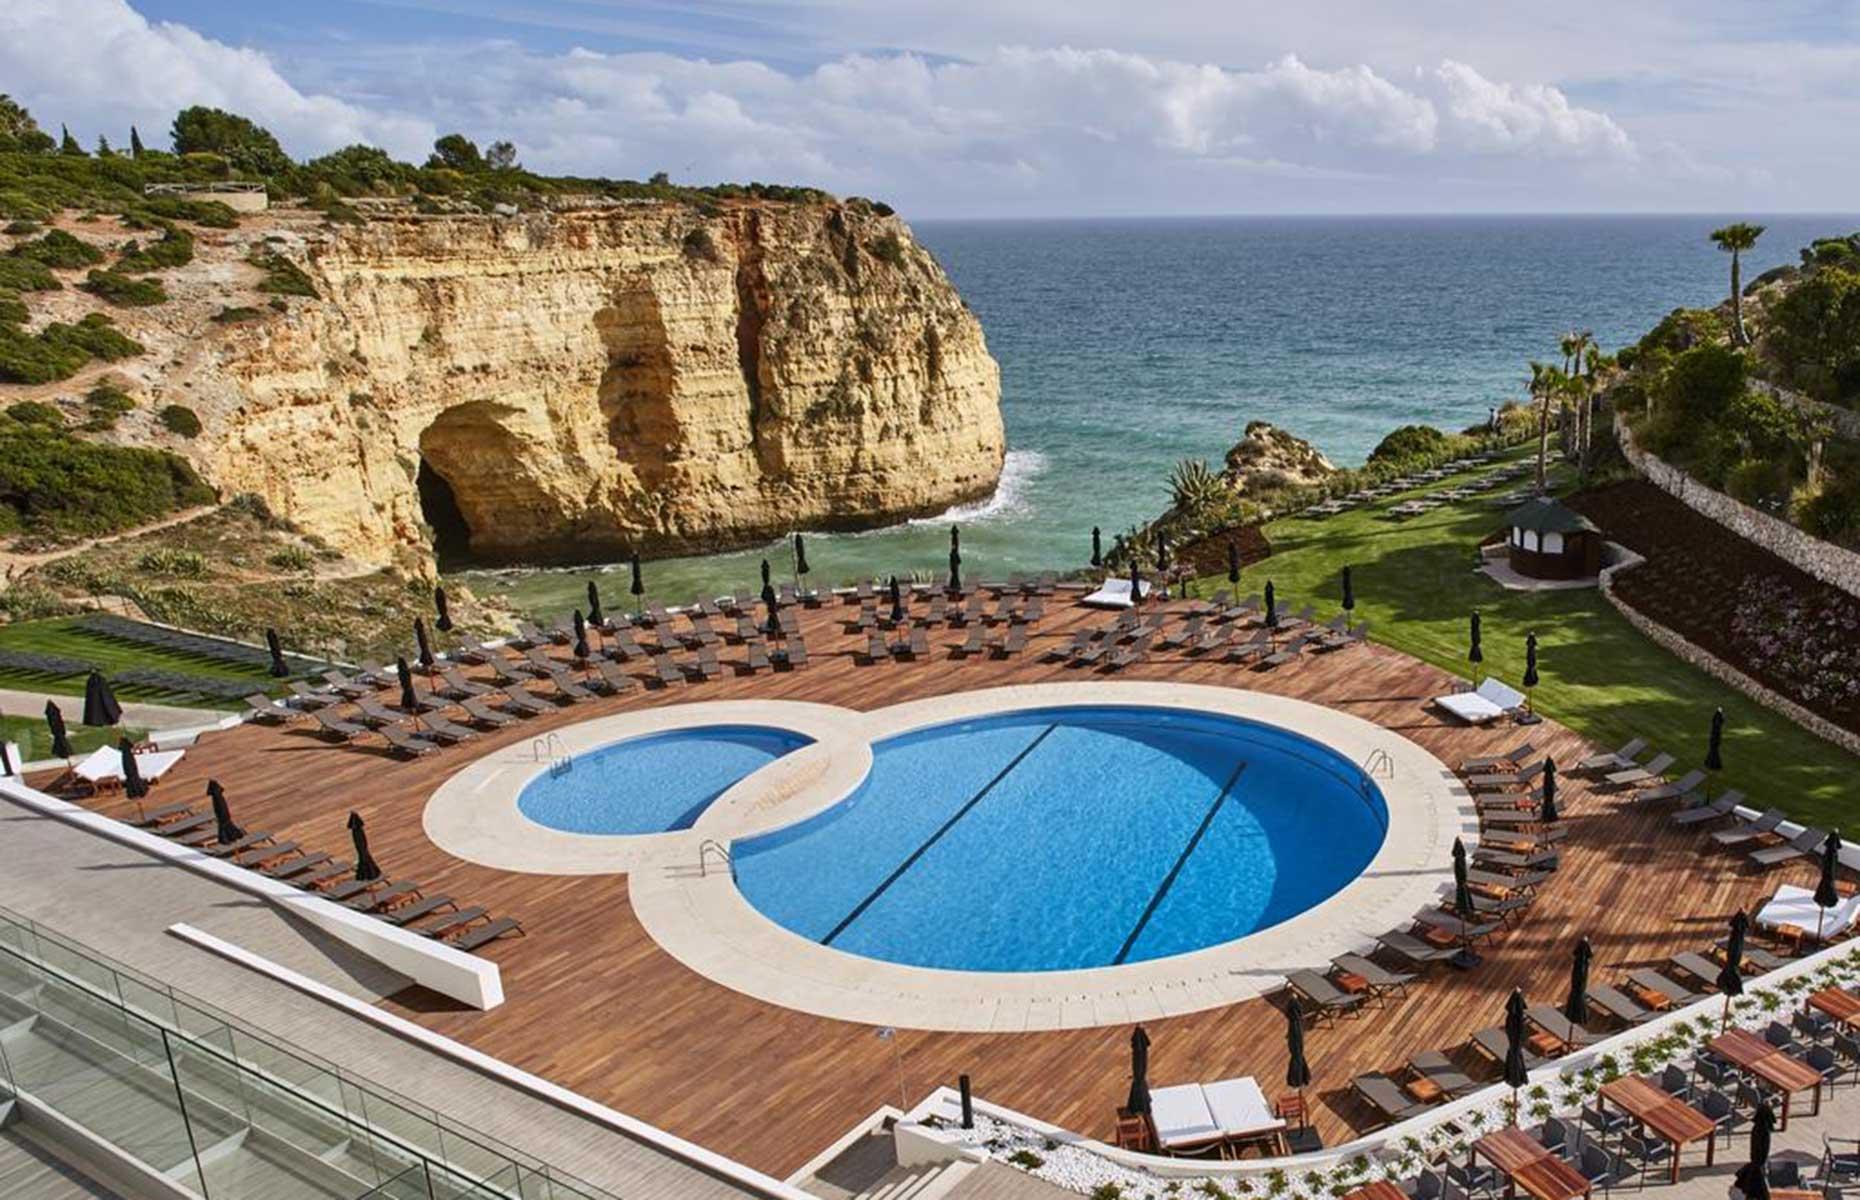 Tivoli Hotel pool and exterior (Image: Tivoli Hotel/booking.com)